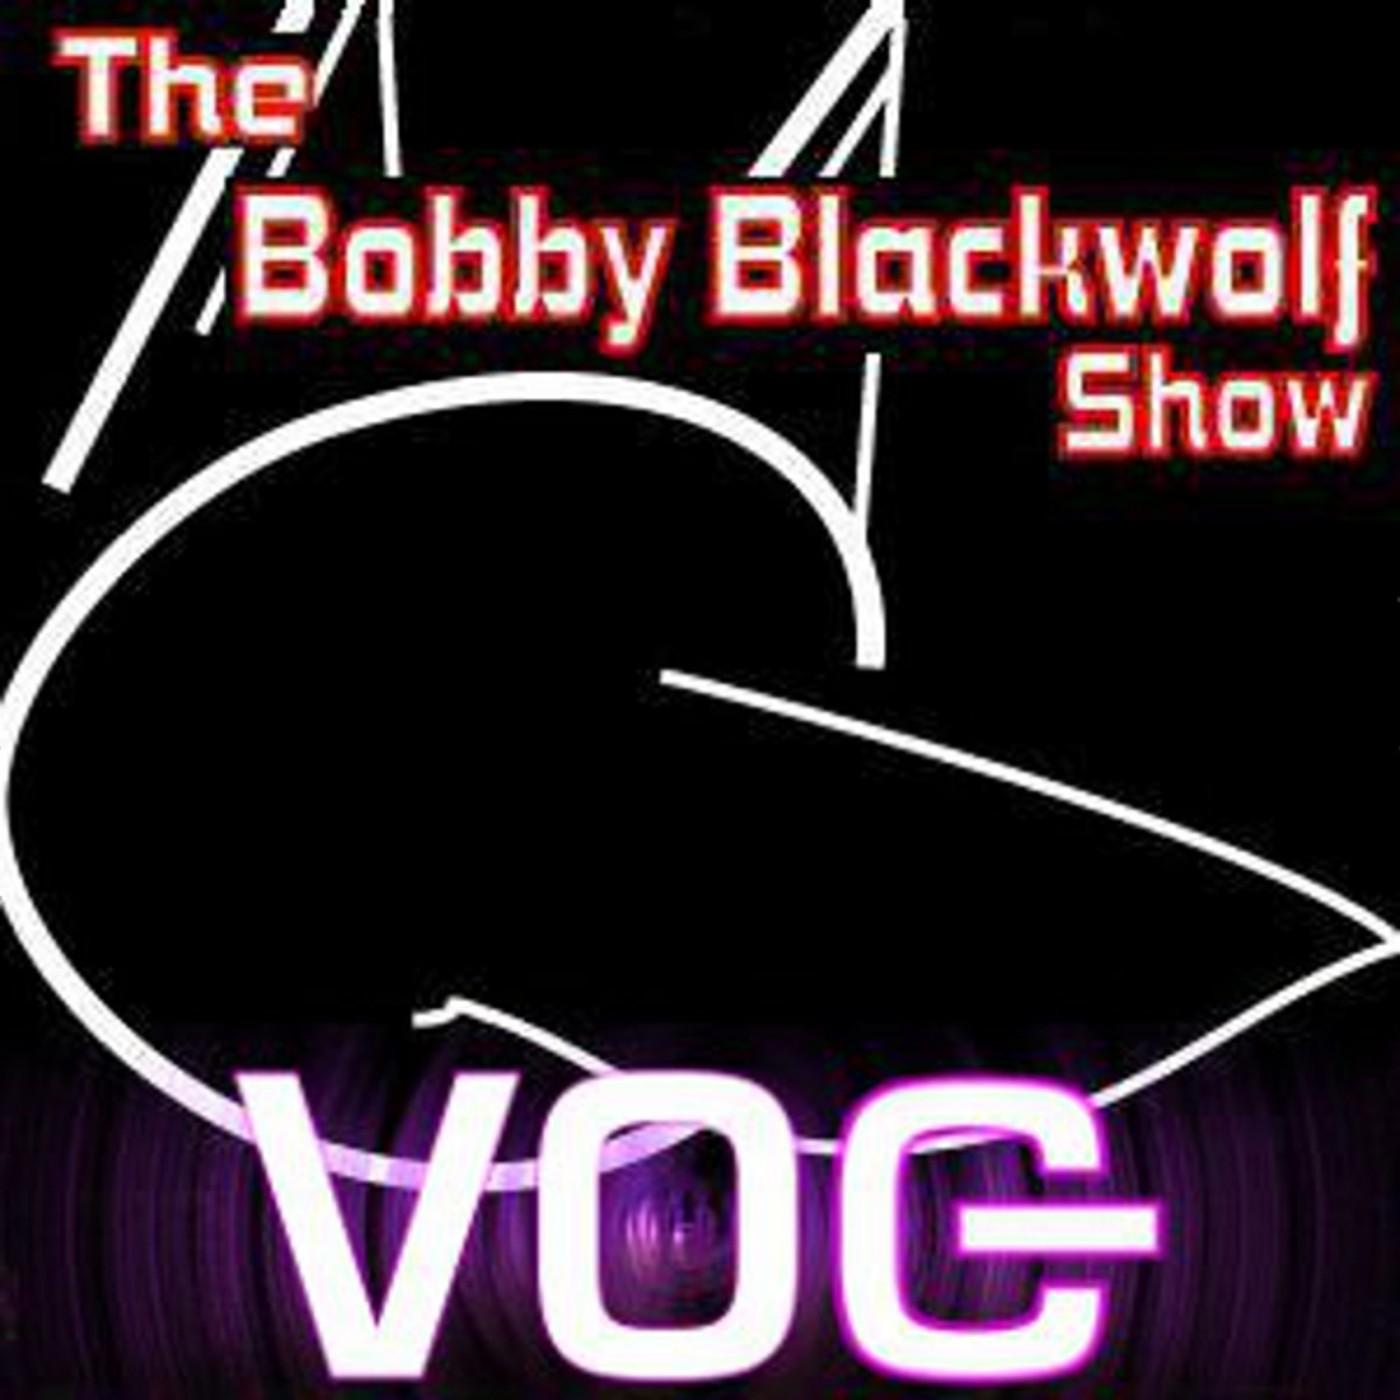 536 - 08/07/16 Bobby Blackwolf Show - Pokemon Go Exodus, No Man's Sky Leak